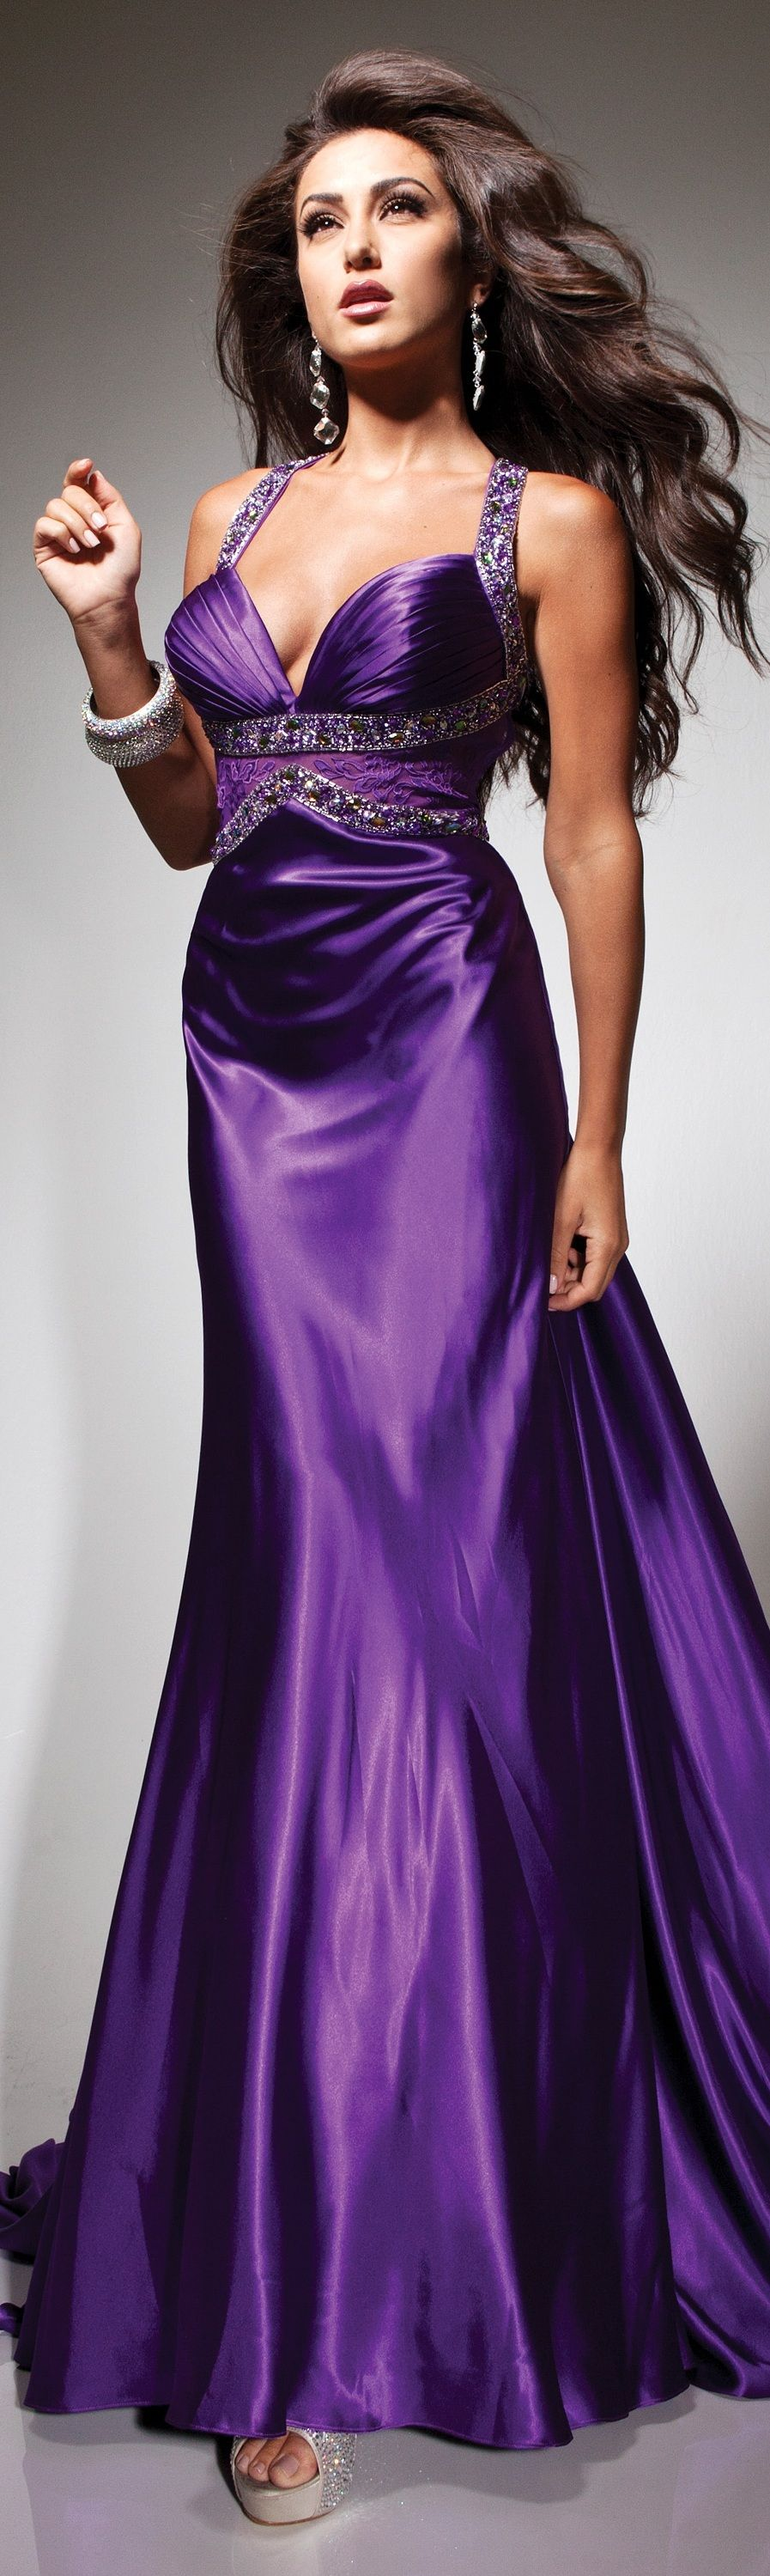 Tony B couture 2013/2014 ~ <3 | Vestidos de formatura Blenda ...